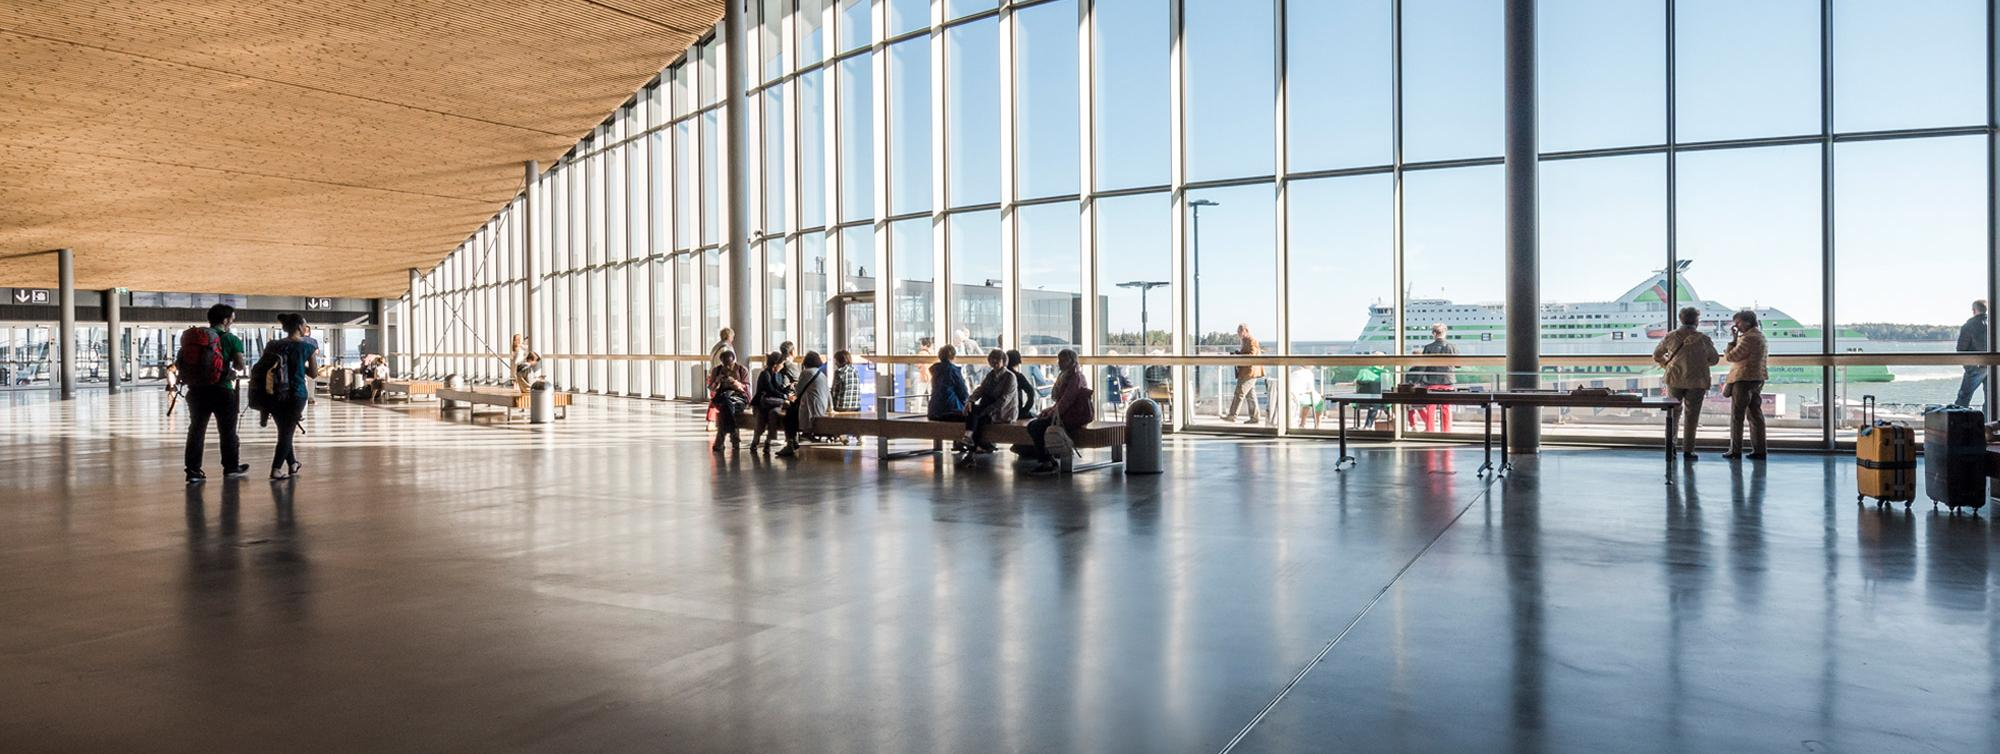 Helsinki collegamento Fi loghi di siti di incontri online